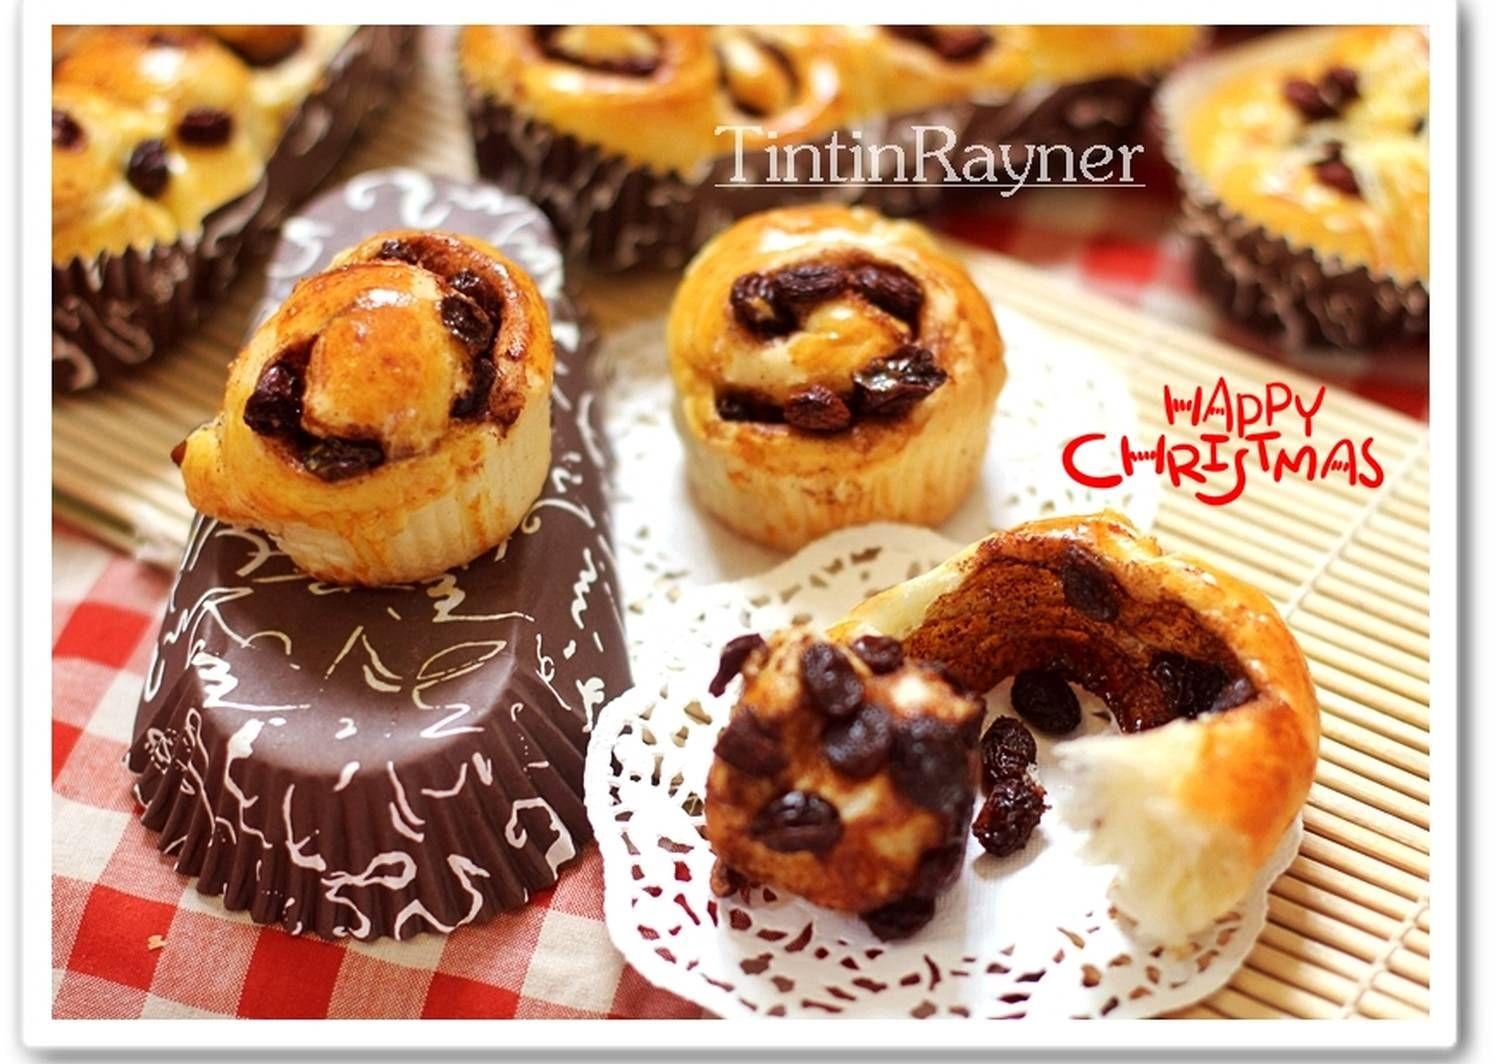 Resep Cara Membentuk Cinnamon Roll Roti Kepang Step By Step Foto Oleh Tintin Rayner Resep Resep Roti Cinnamon Roll Cinnamon Roll